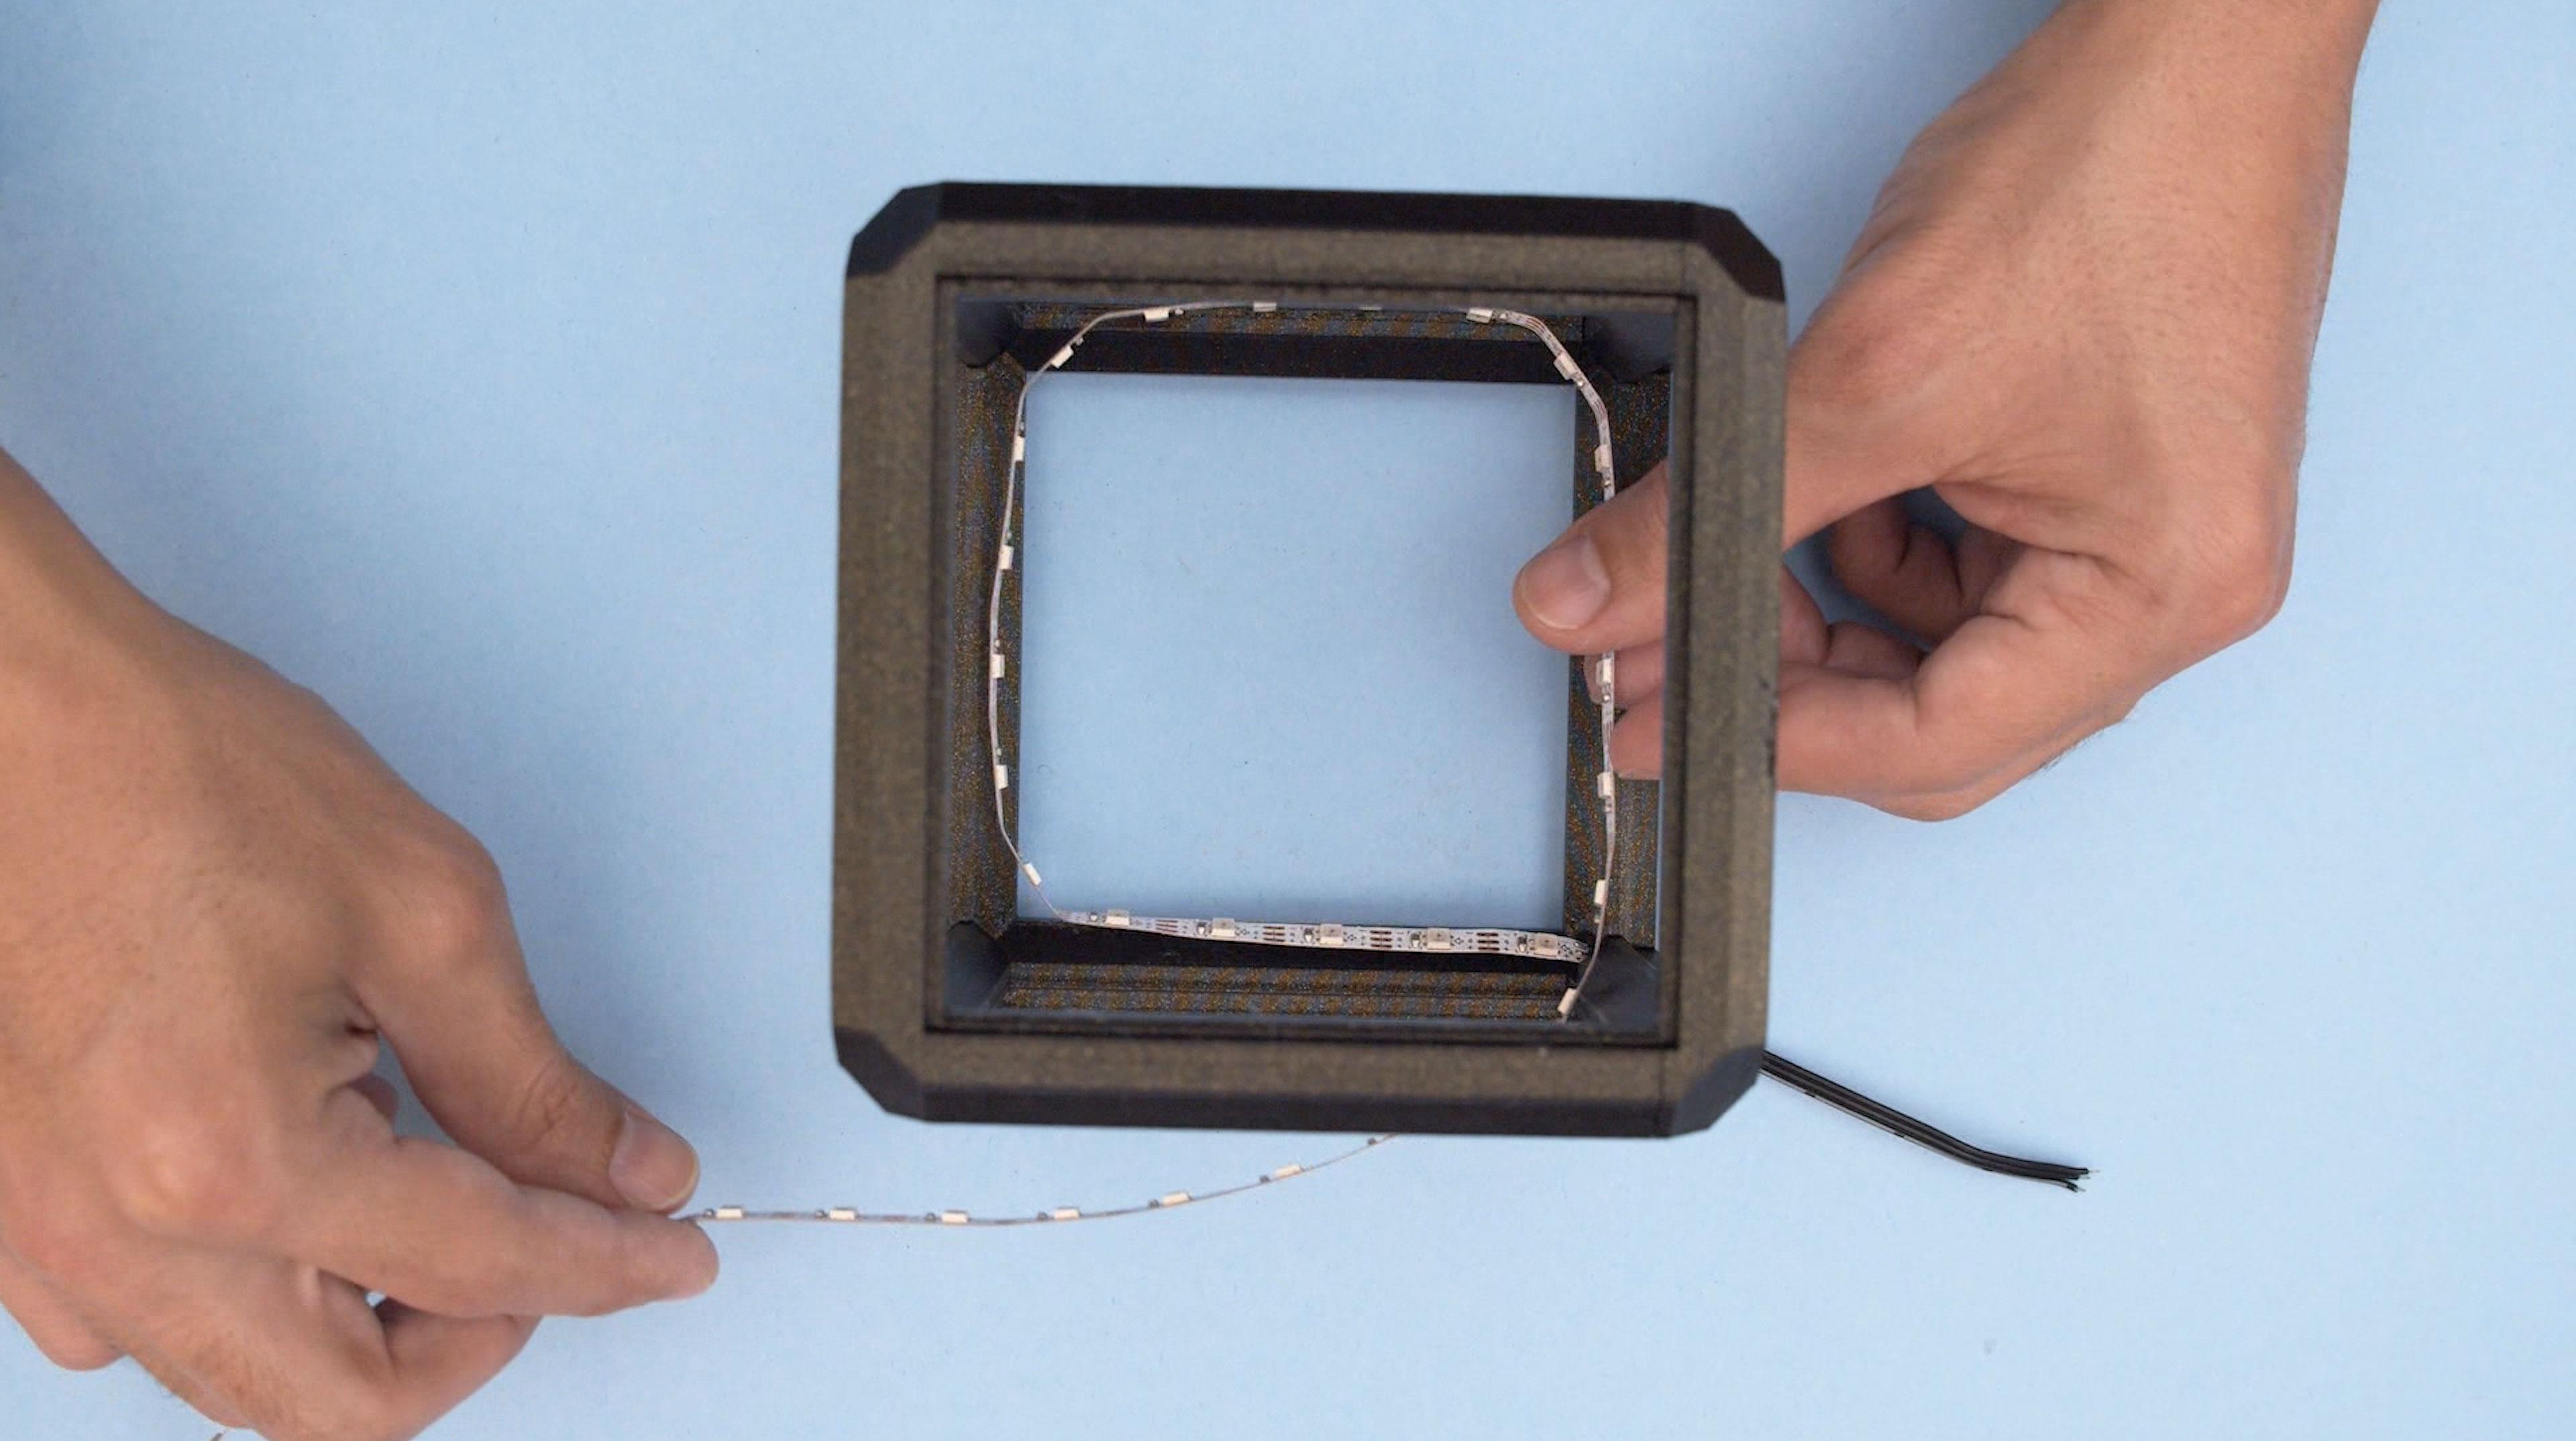 led_strips_strip-around-frame.jpg